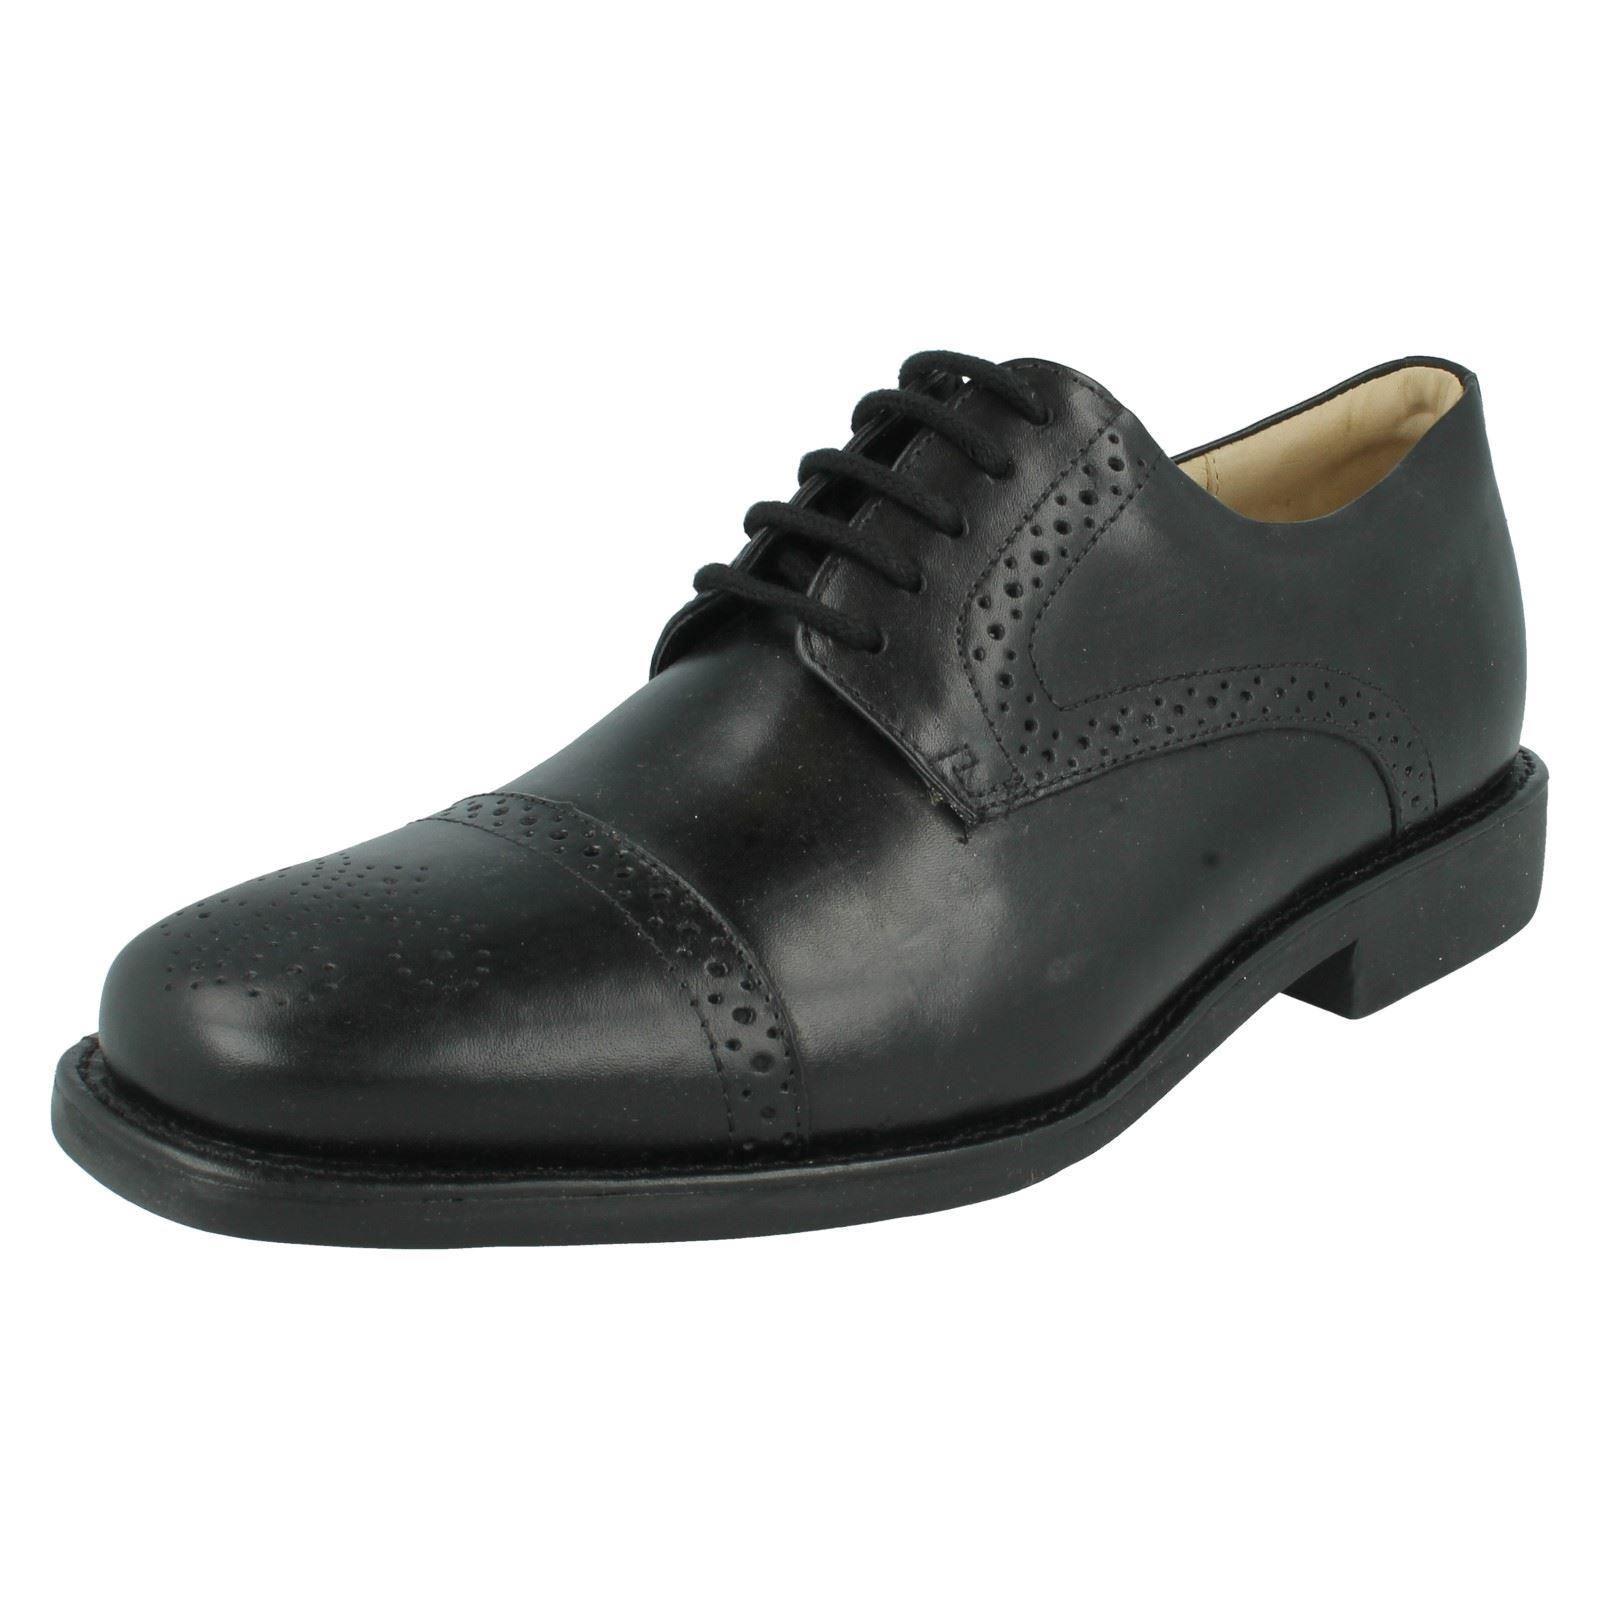 Mens Anatomic & Co 'Araras' Shoes The Style ~ K